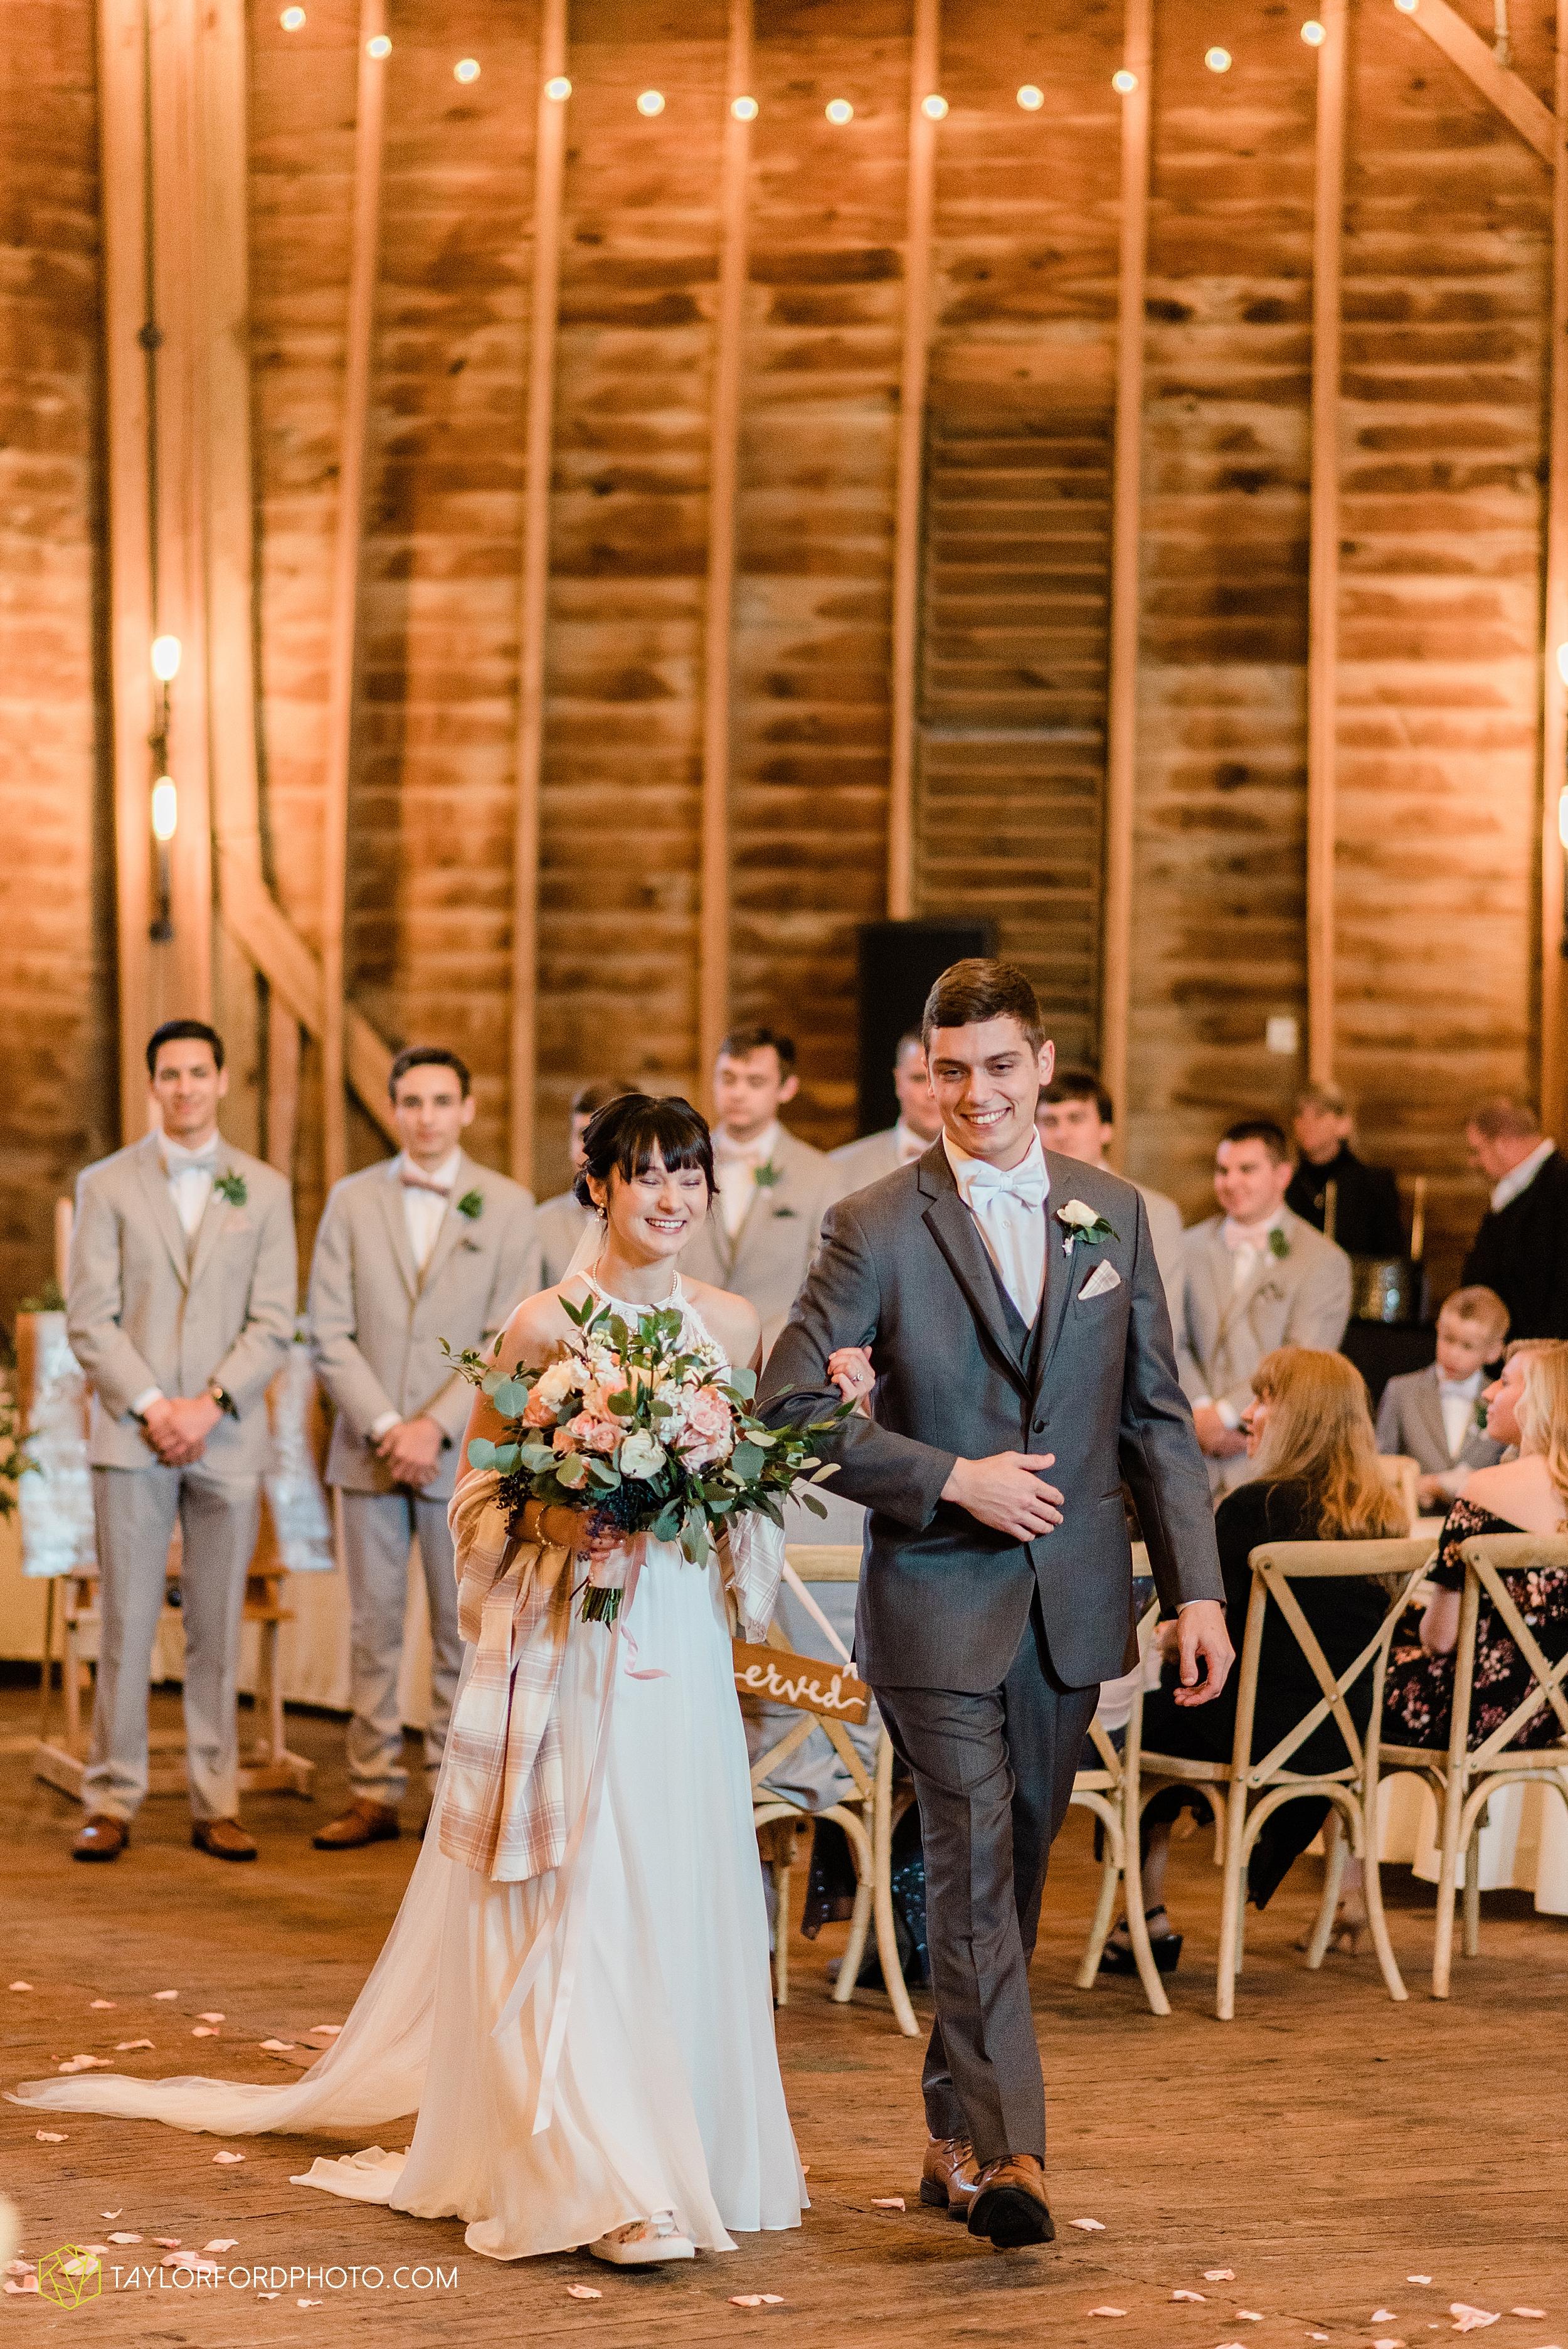 marissa-nicole-nick-daeger-orrmont-estate-farm-wedding-piqua-dayton-troy-ohio-fall-photographer-taylor-ford-photography_1530.jpg